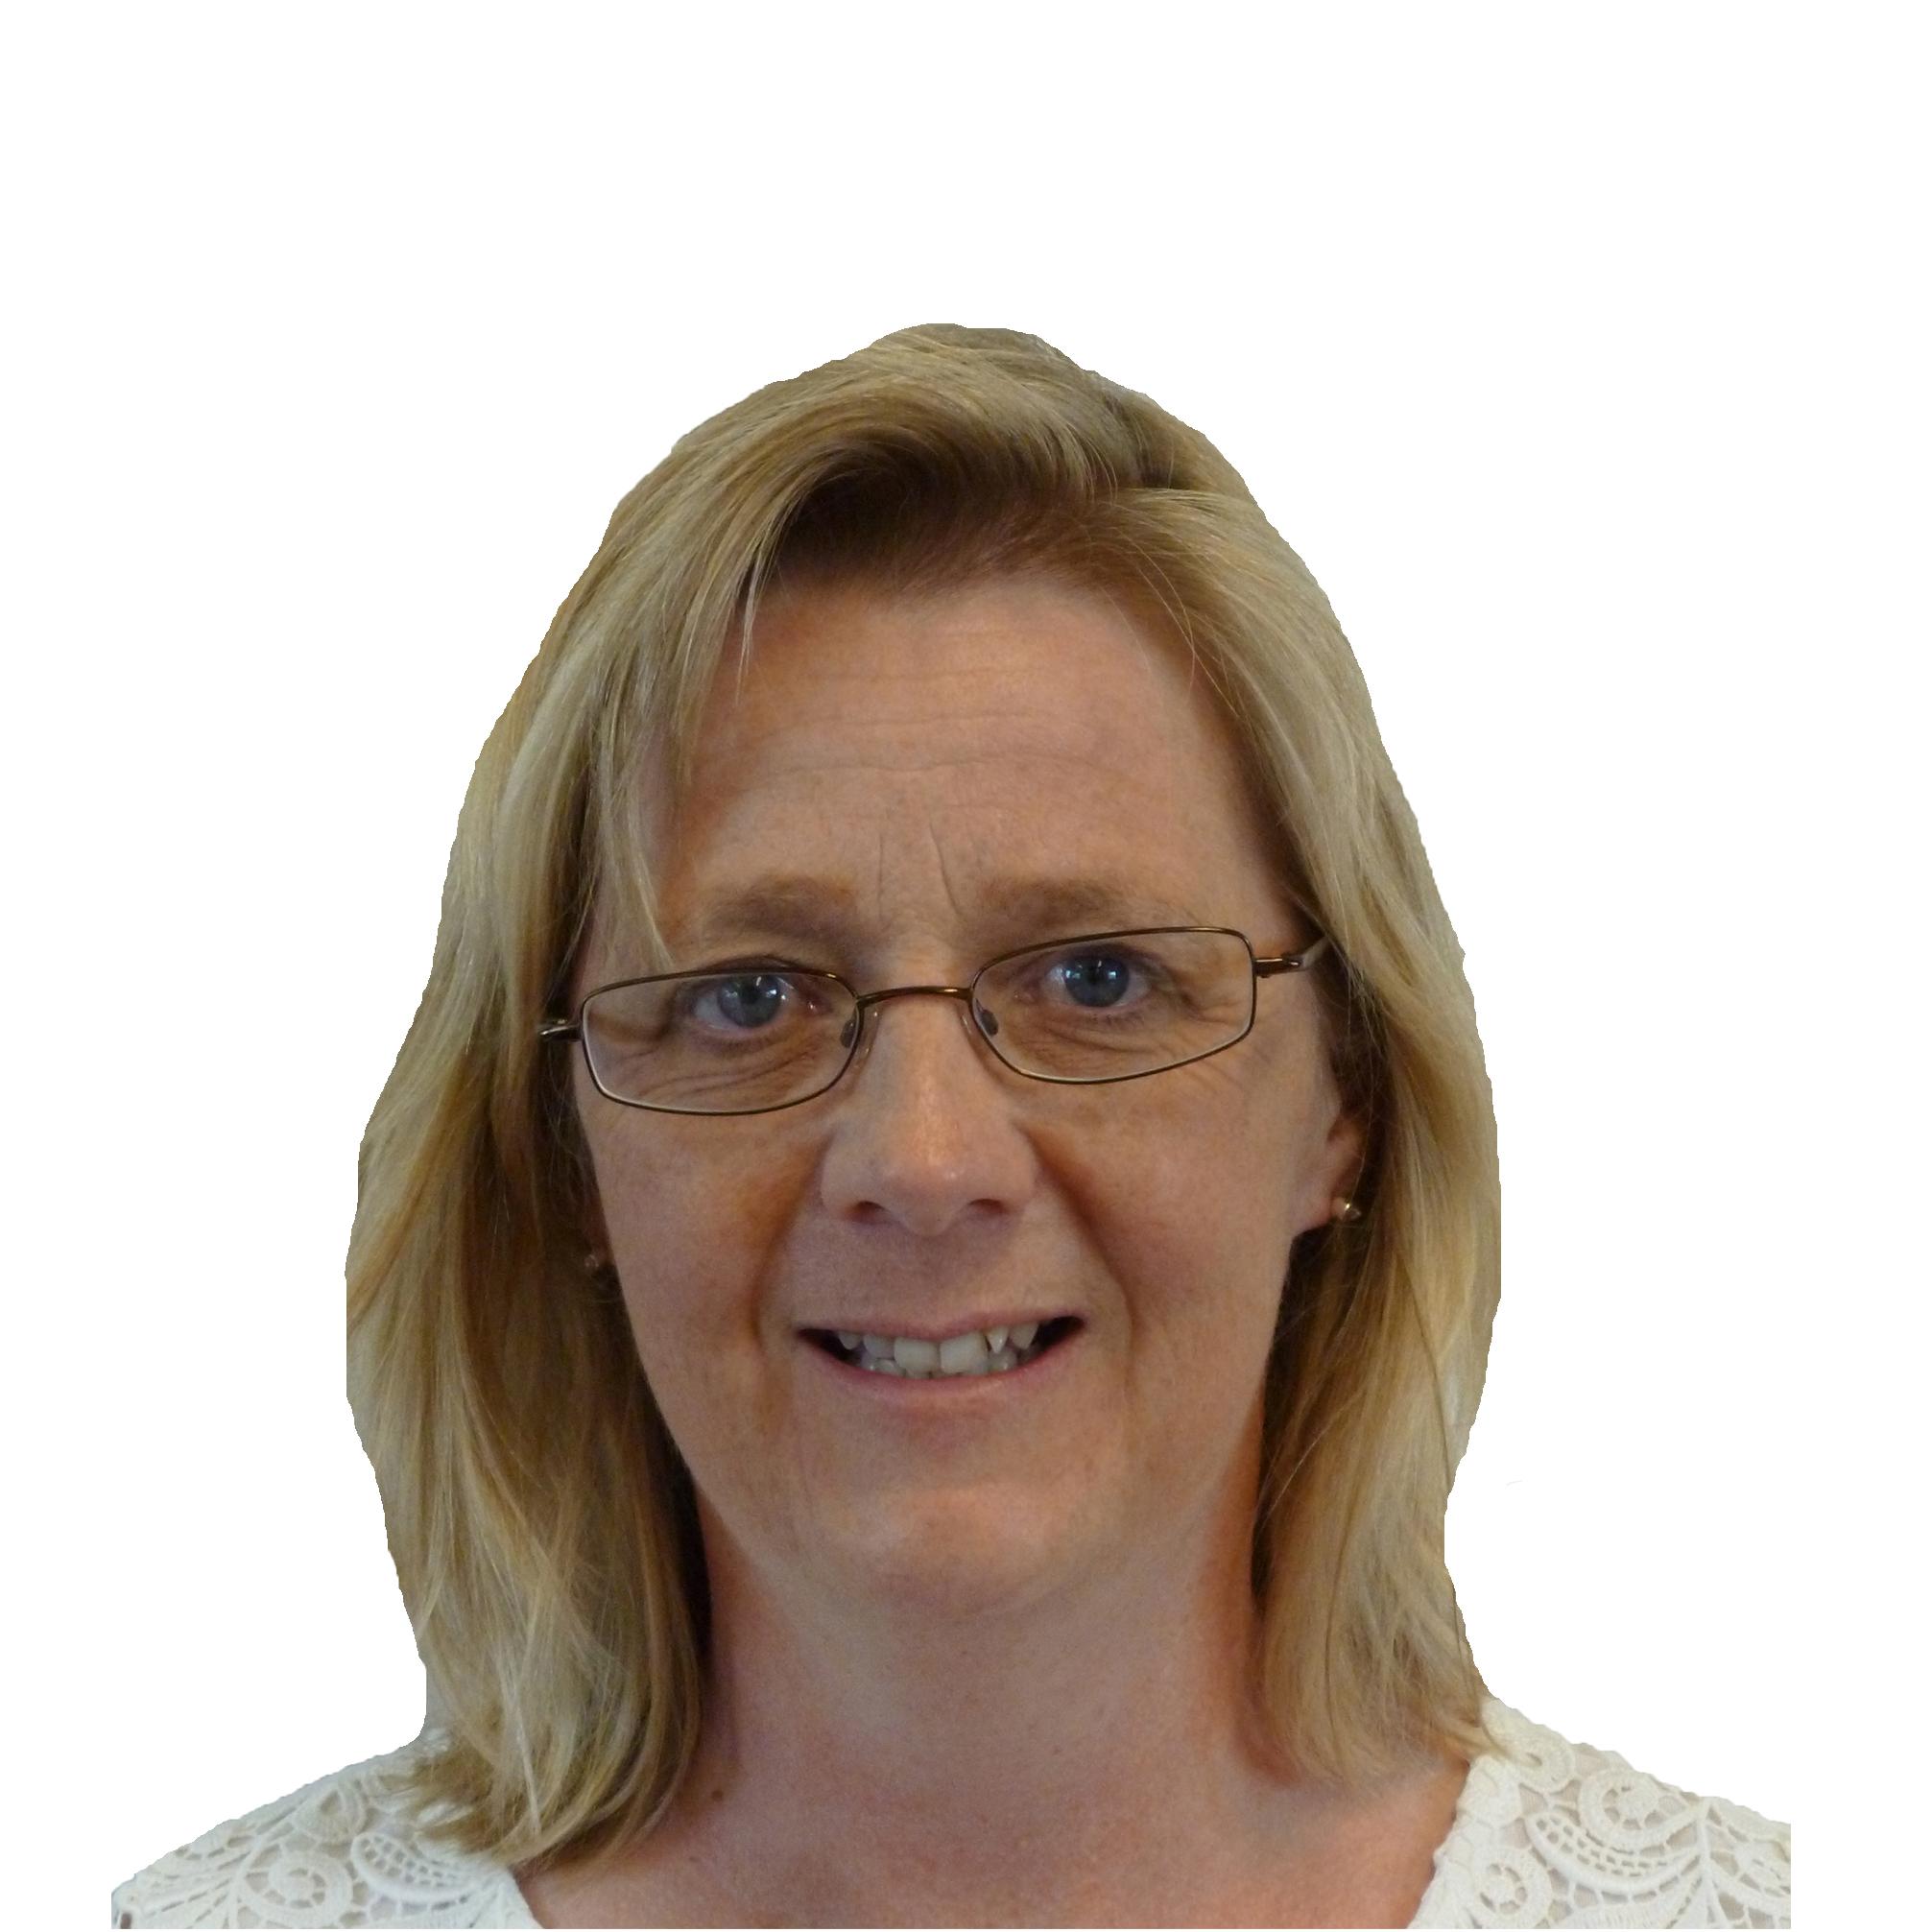 Zarana Haines : Head of Science, Studley High School